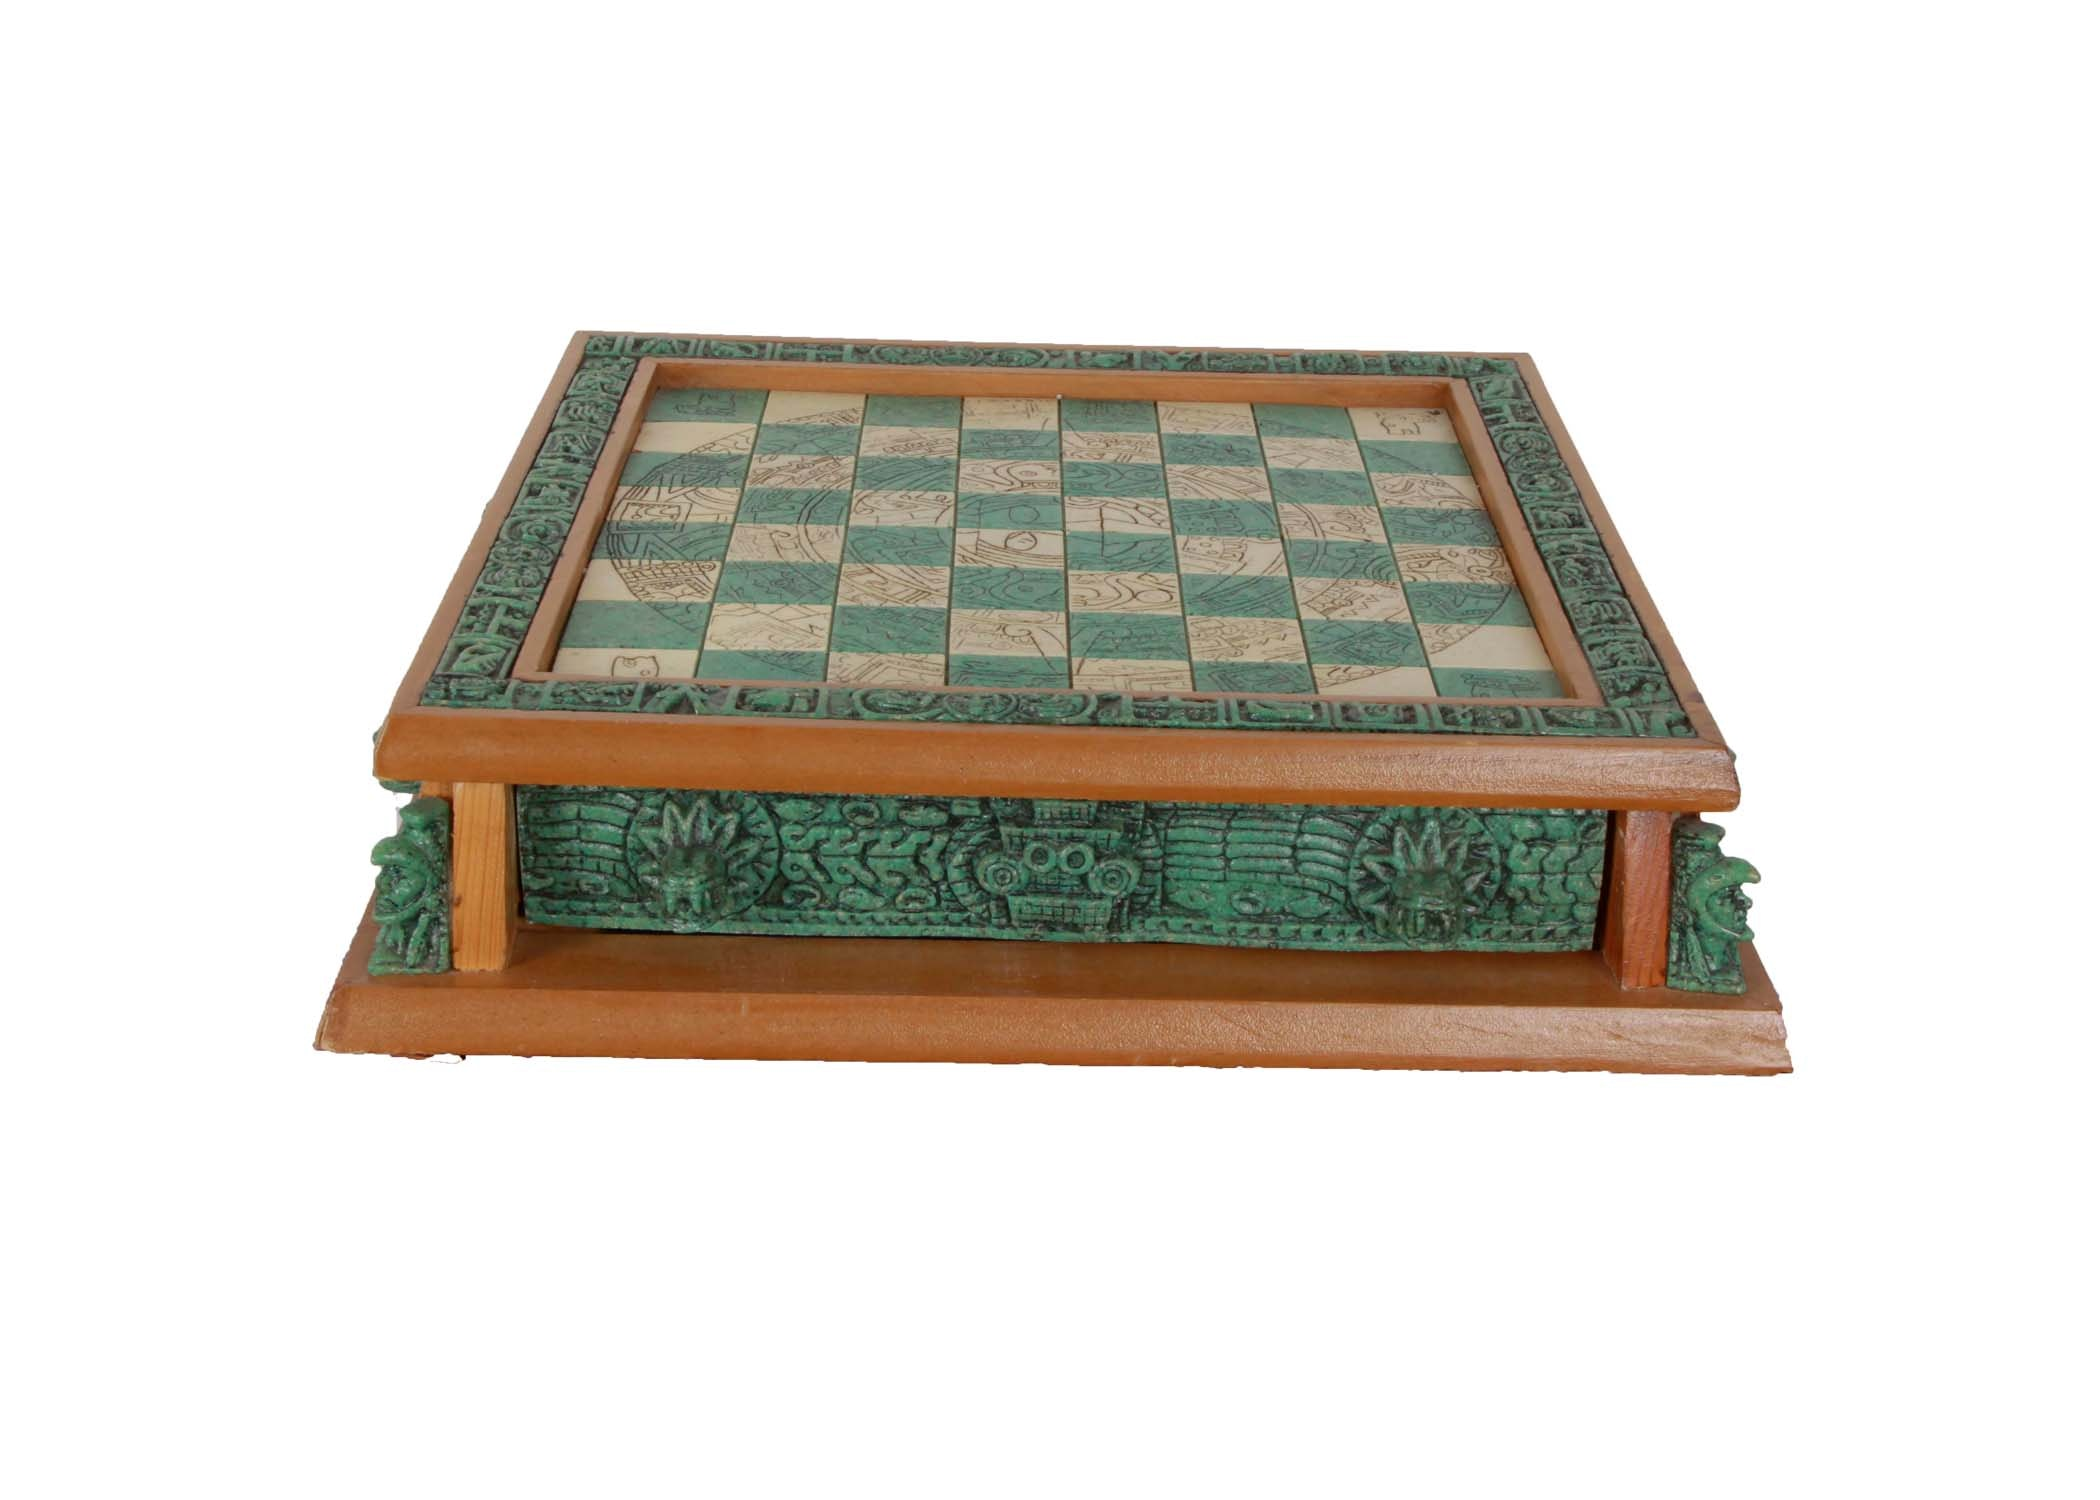 Aztec Chess Set; 1x1 ...